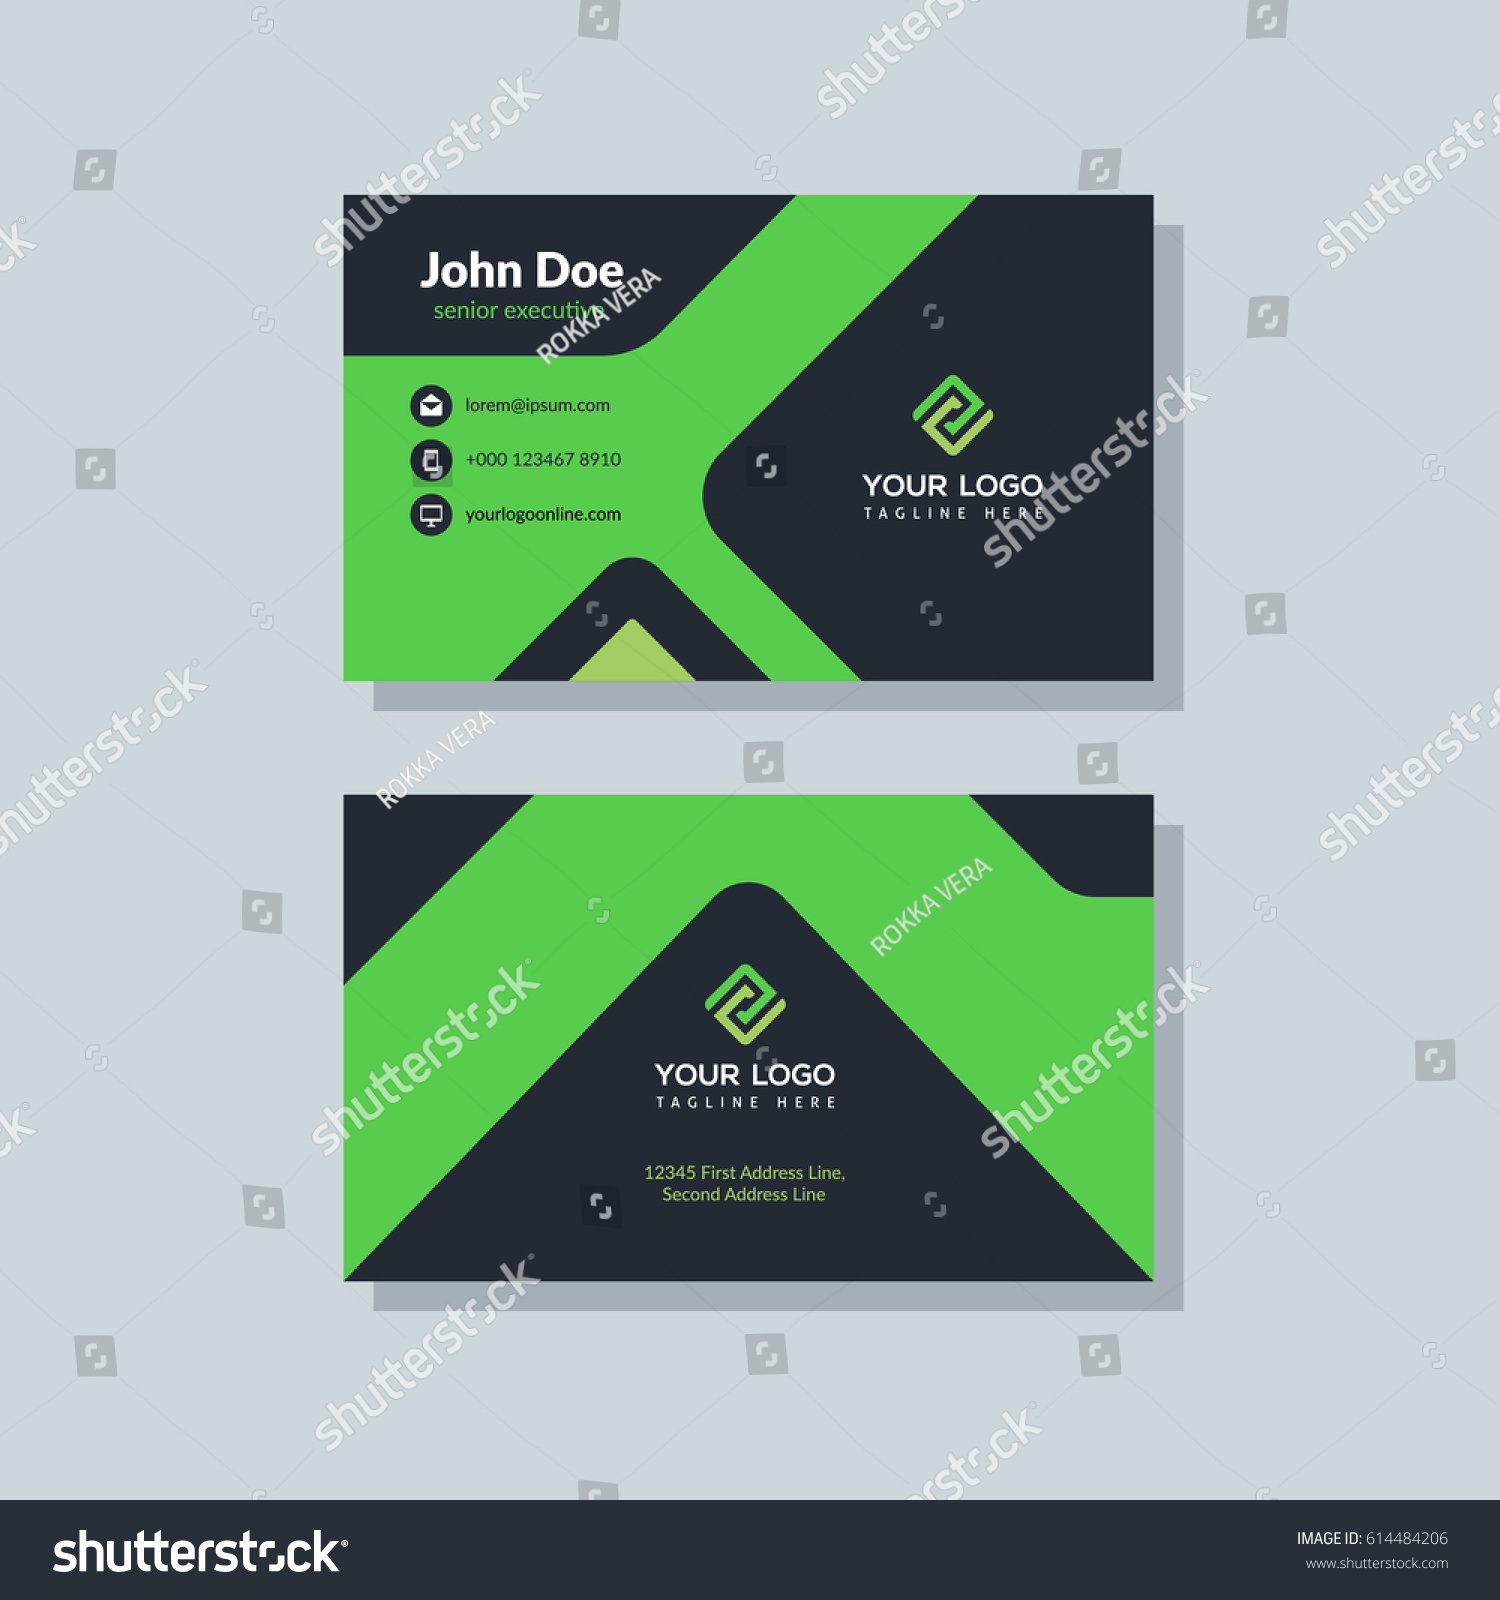 Modern Black Green Business Card Template Stock Photo (Photo, Vector ...